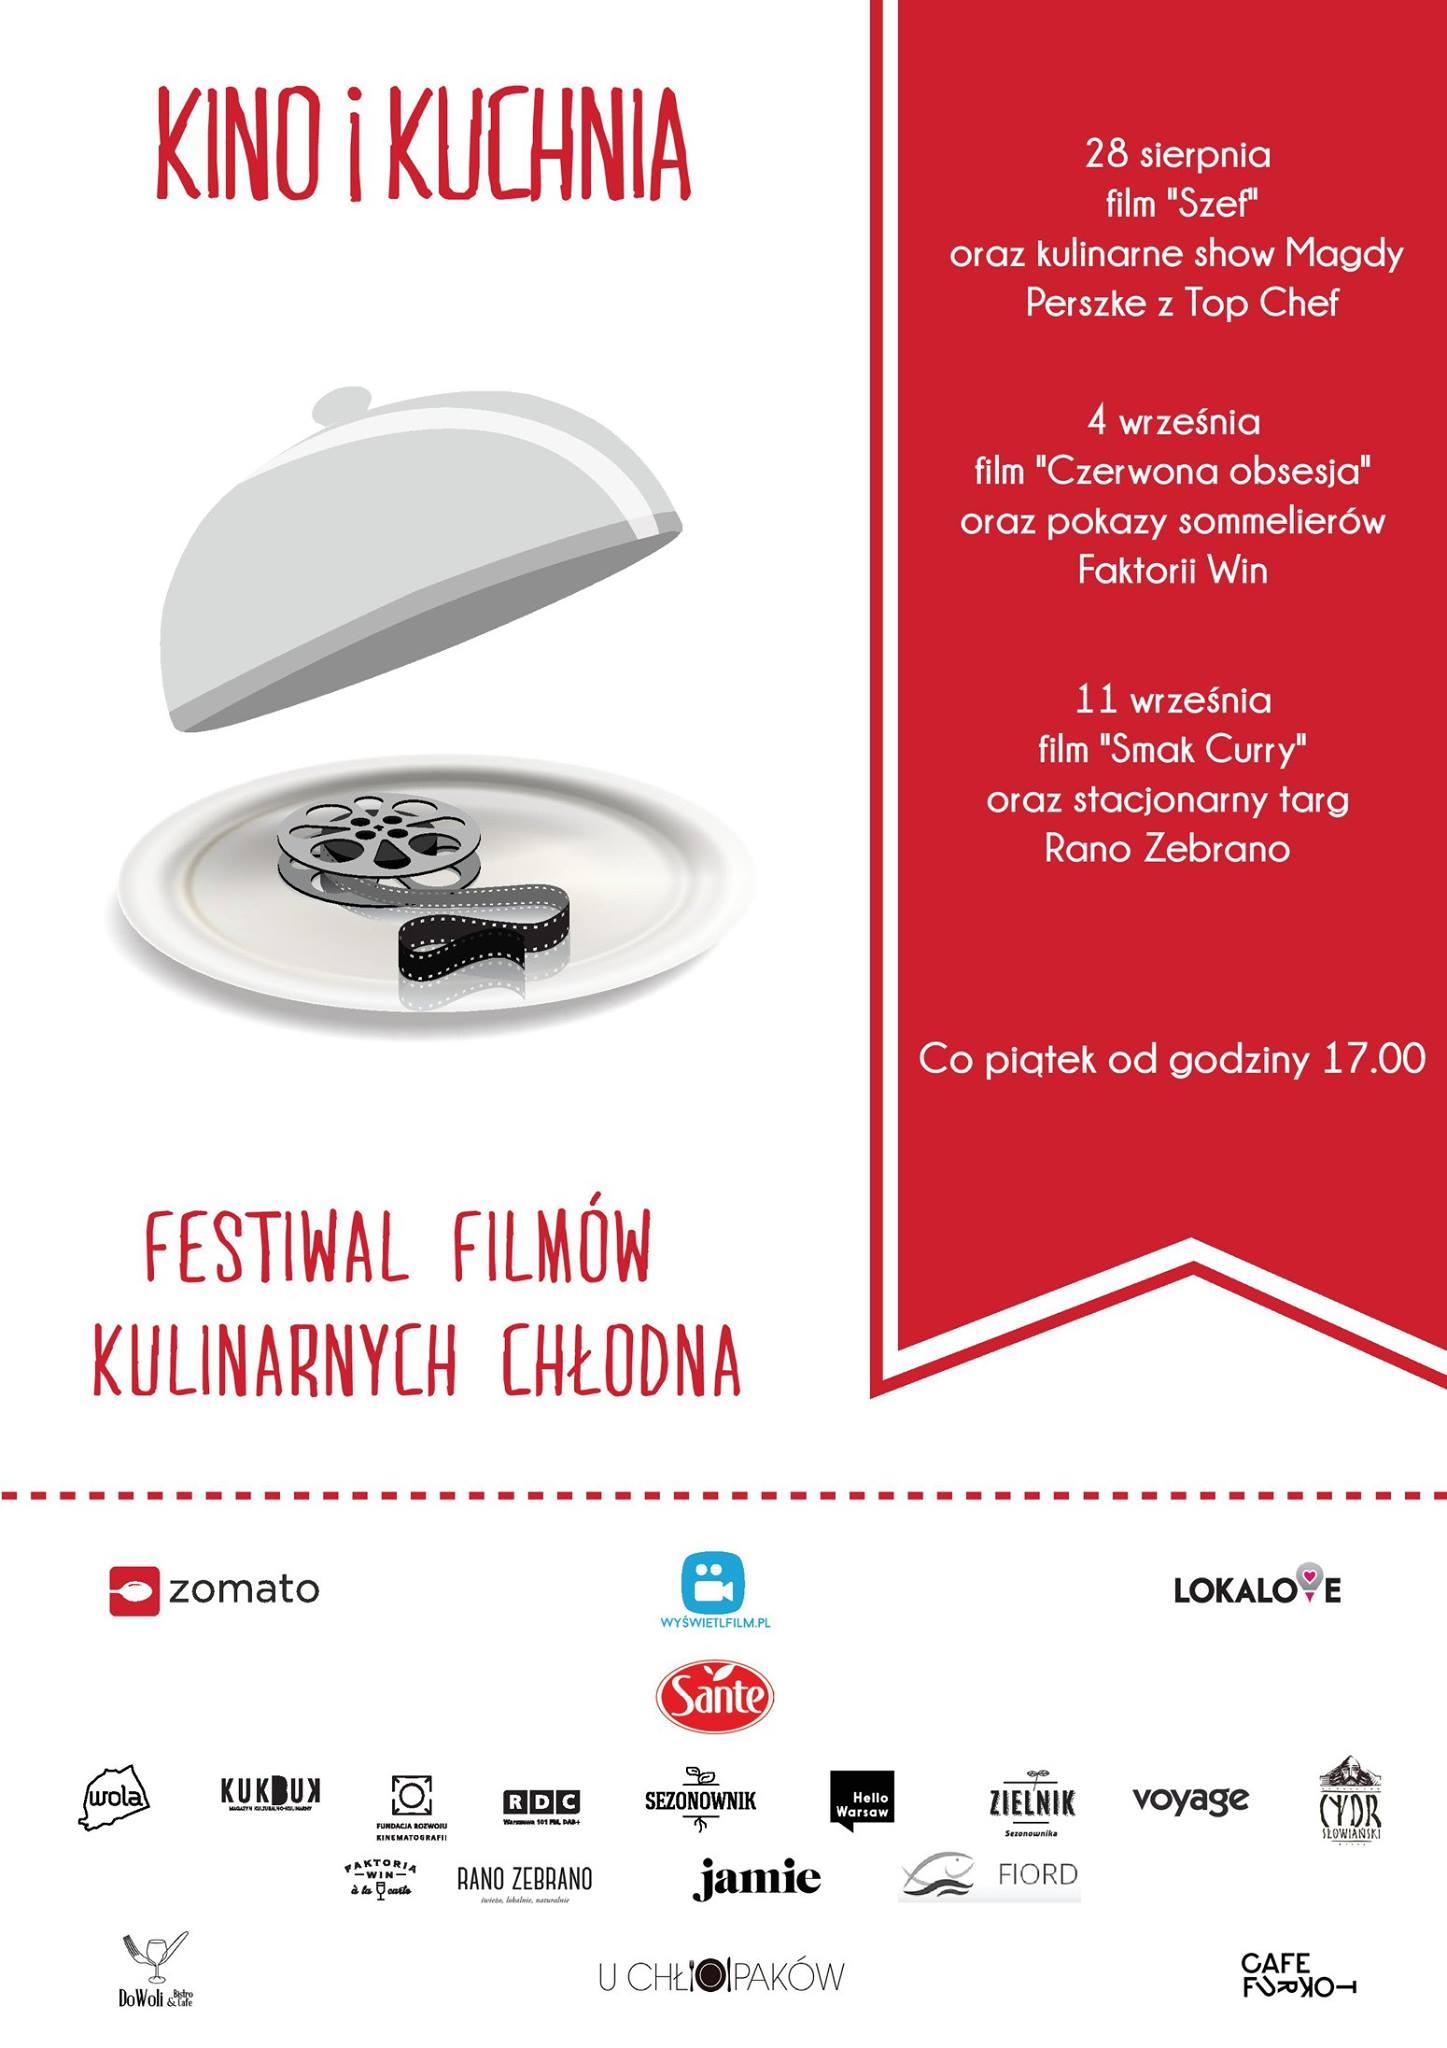 kino kuchnia